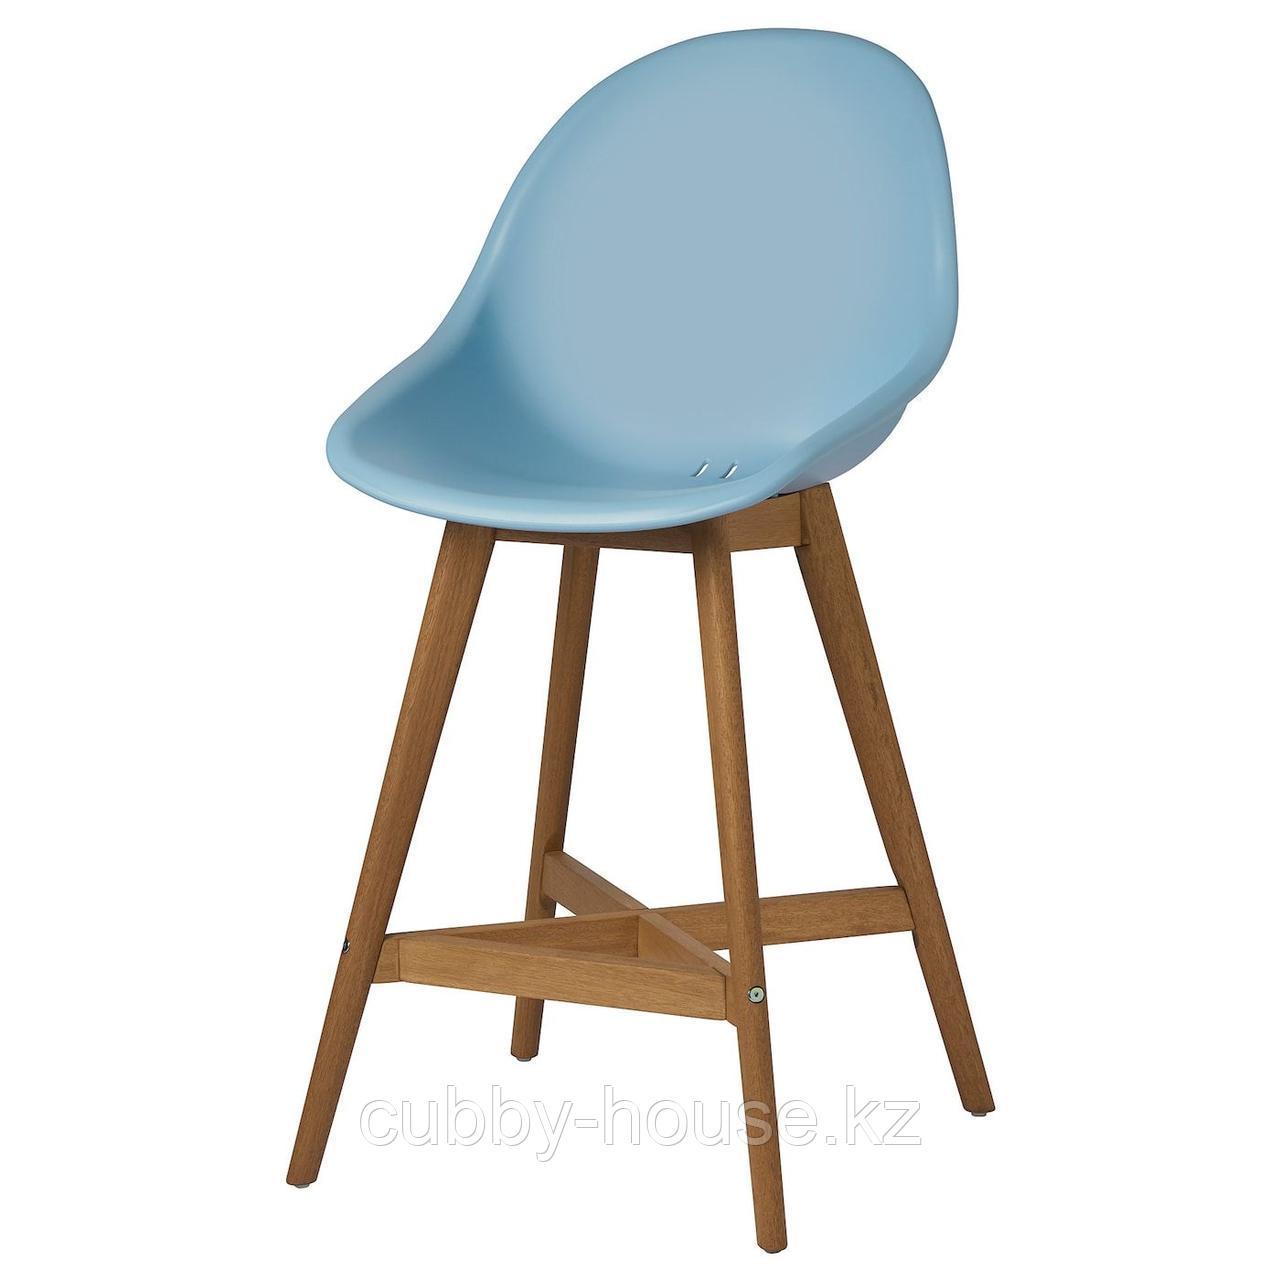 ФАНБЮН Барный стул для дома/сада, голубой, 64 см